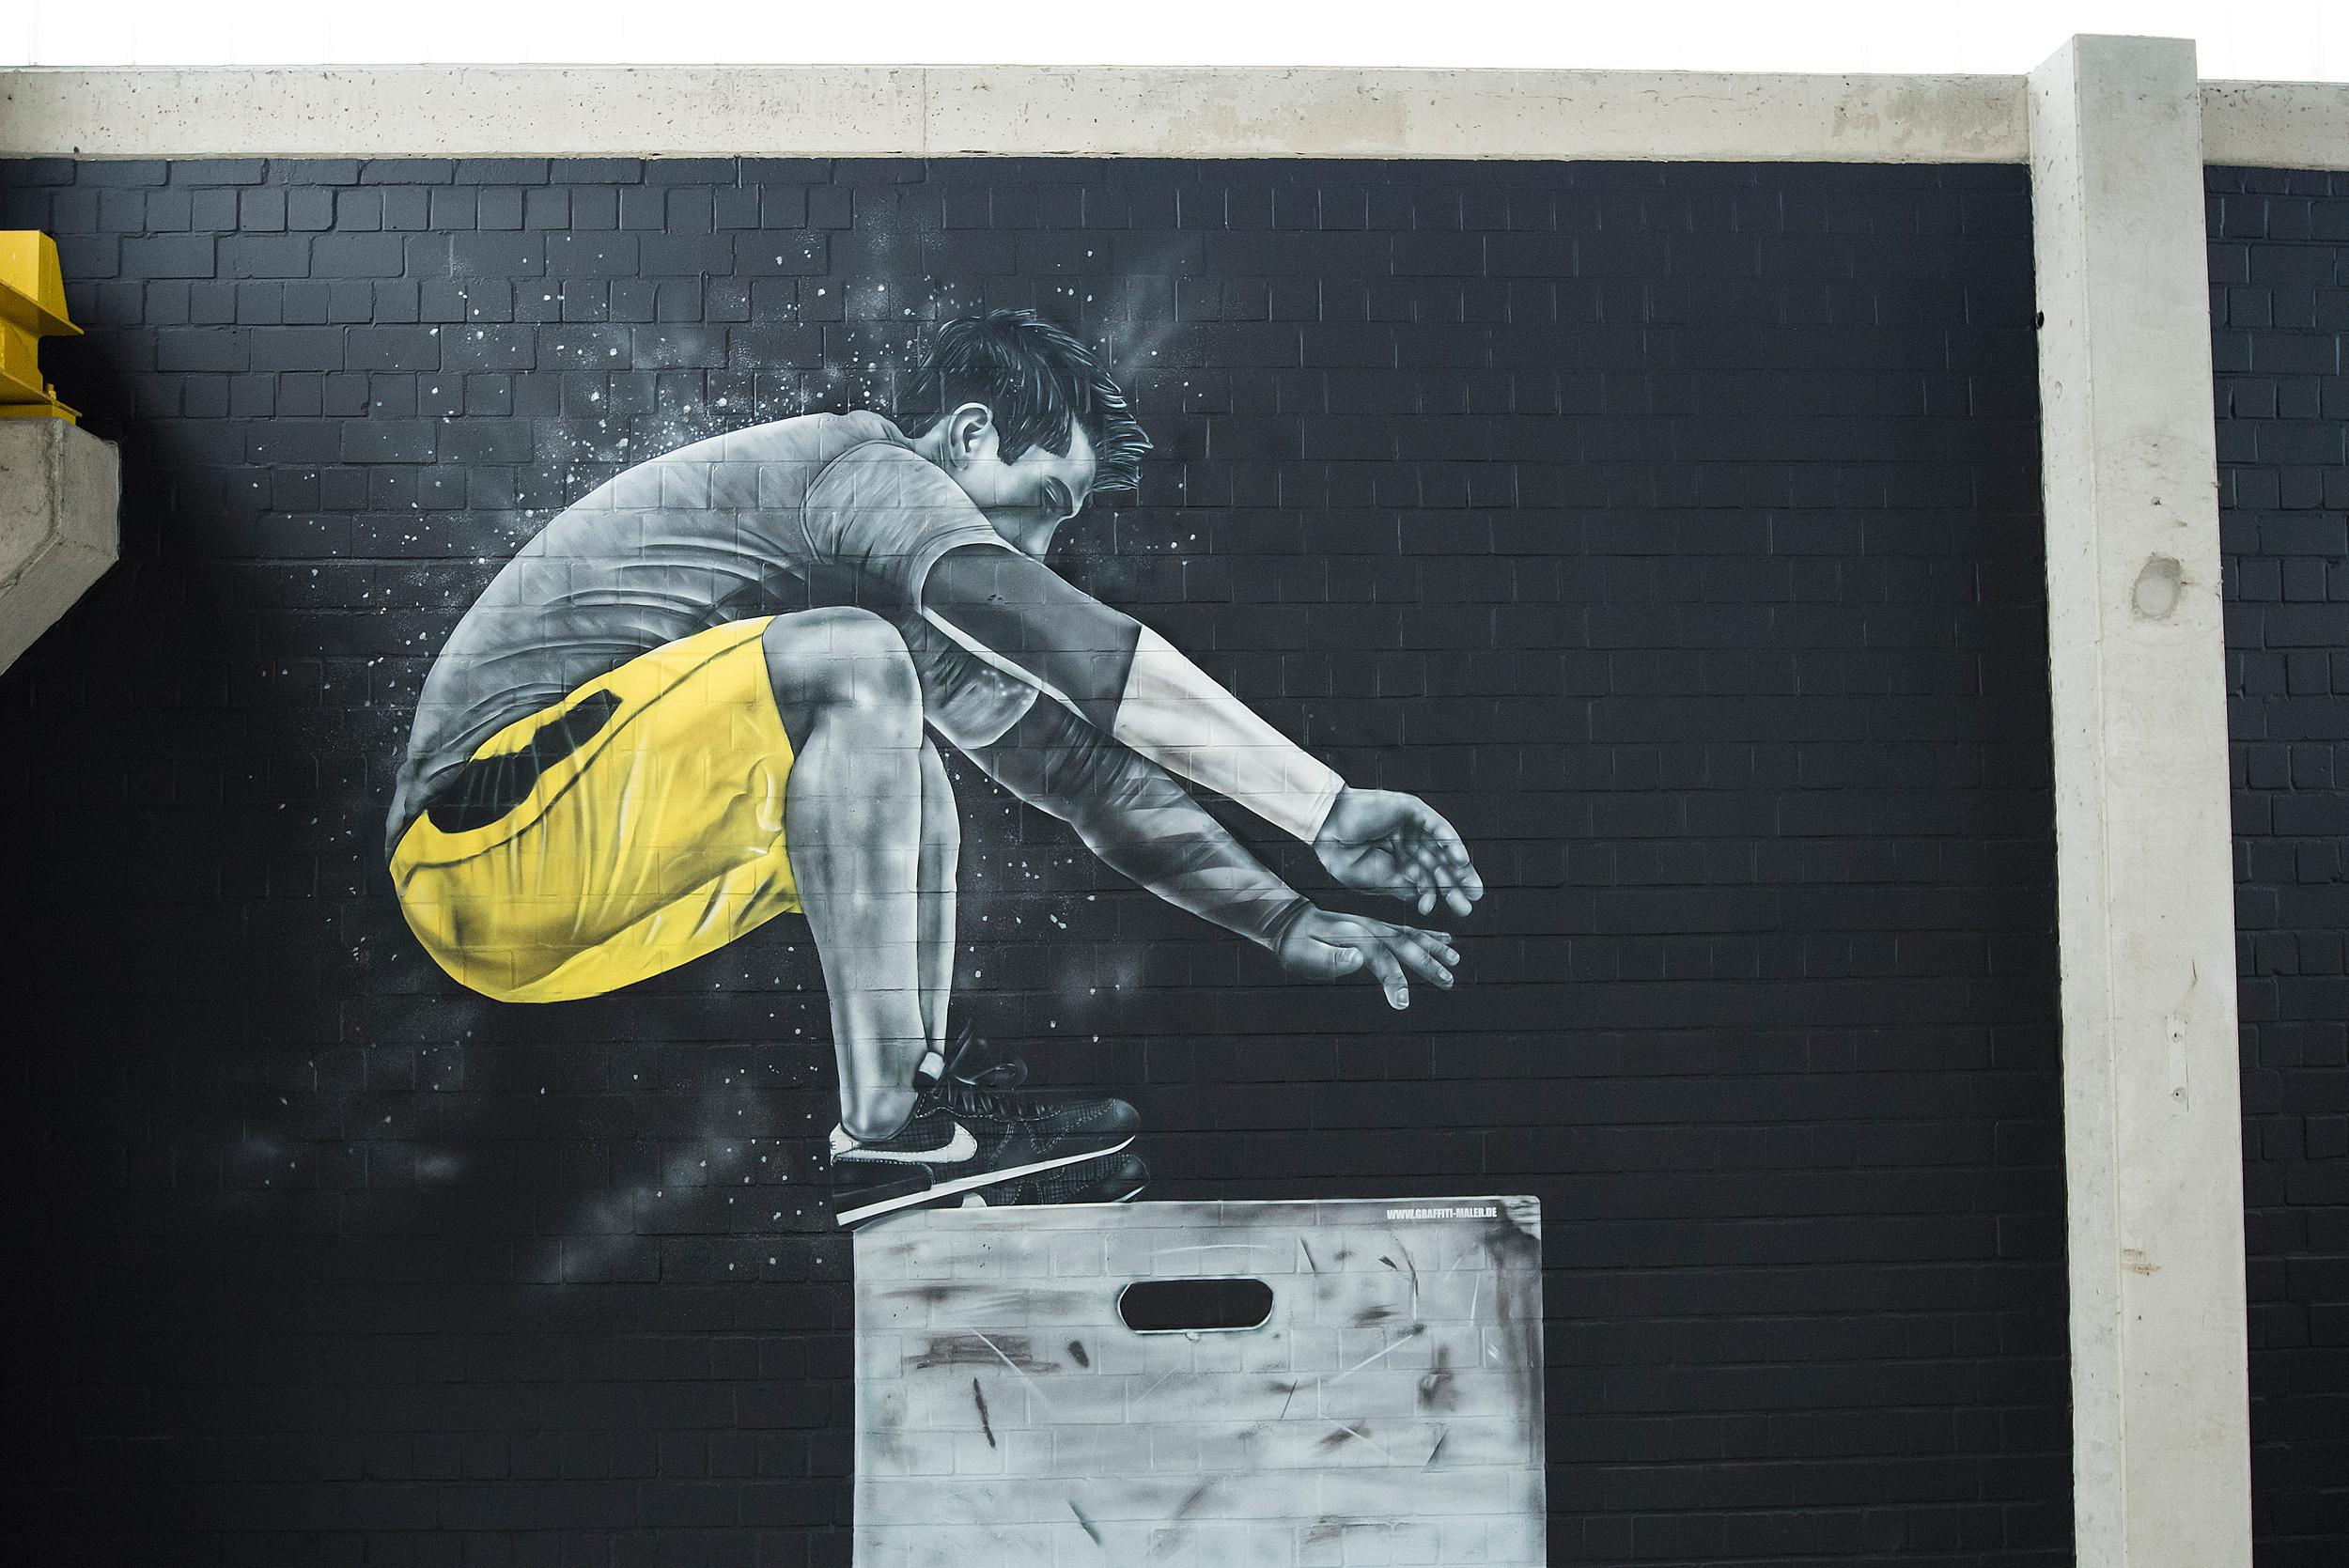 Graffiti Wandgestaltung im Fitness Studio